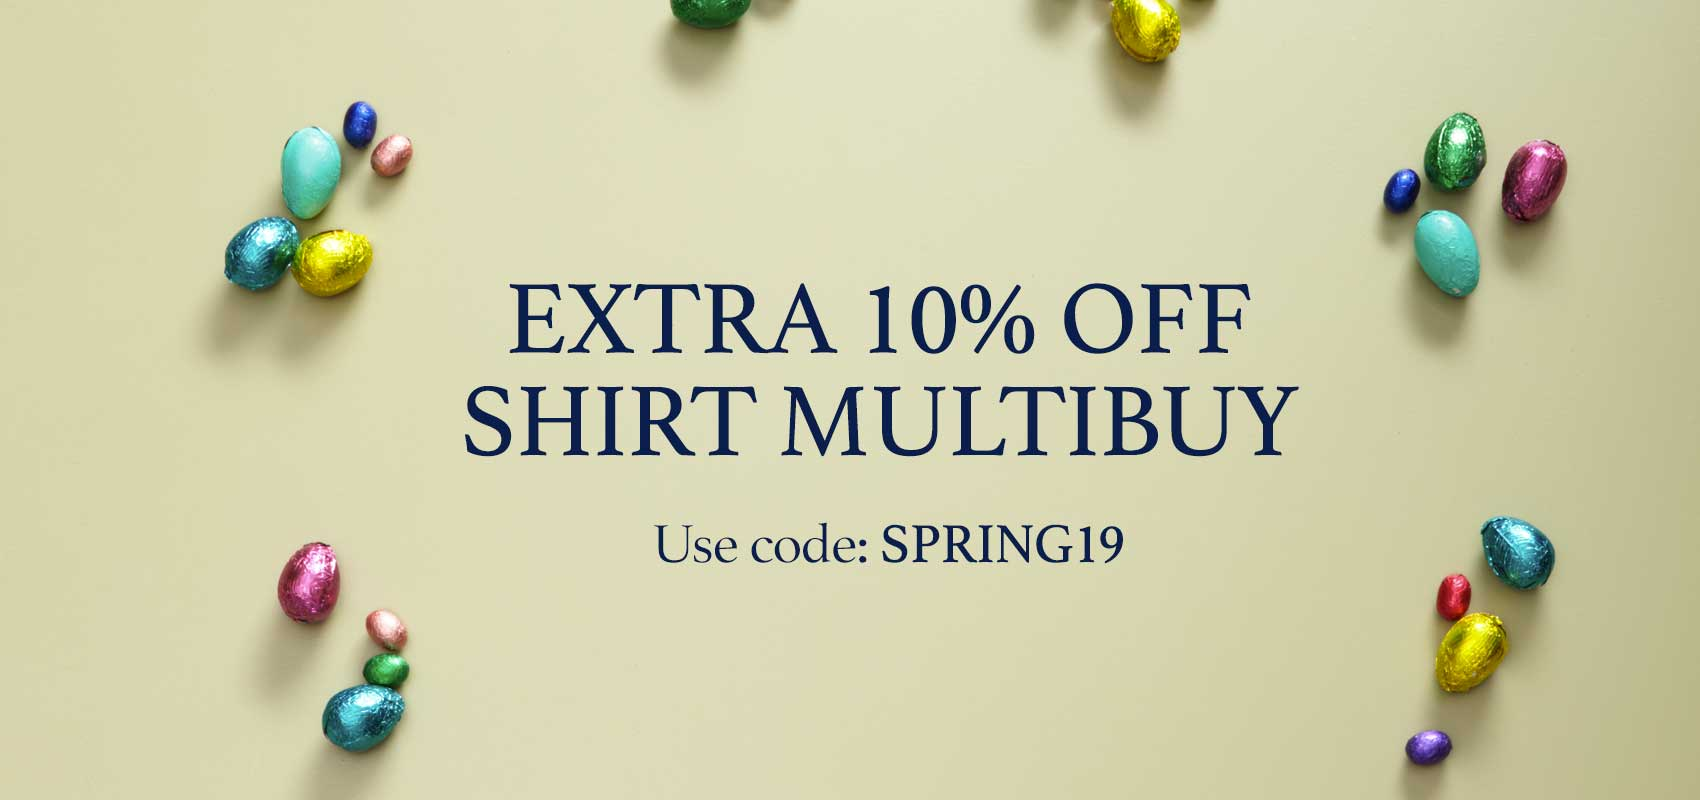 Charles Tyrwhitt extra 10% off shirt multibuy